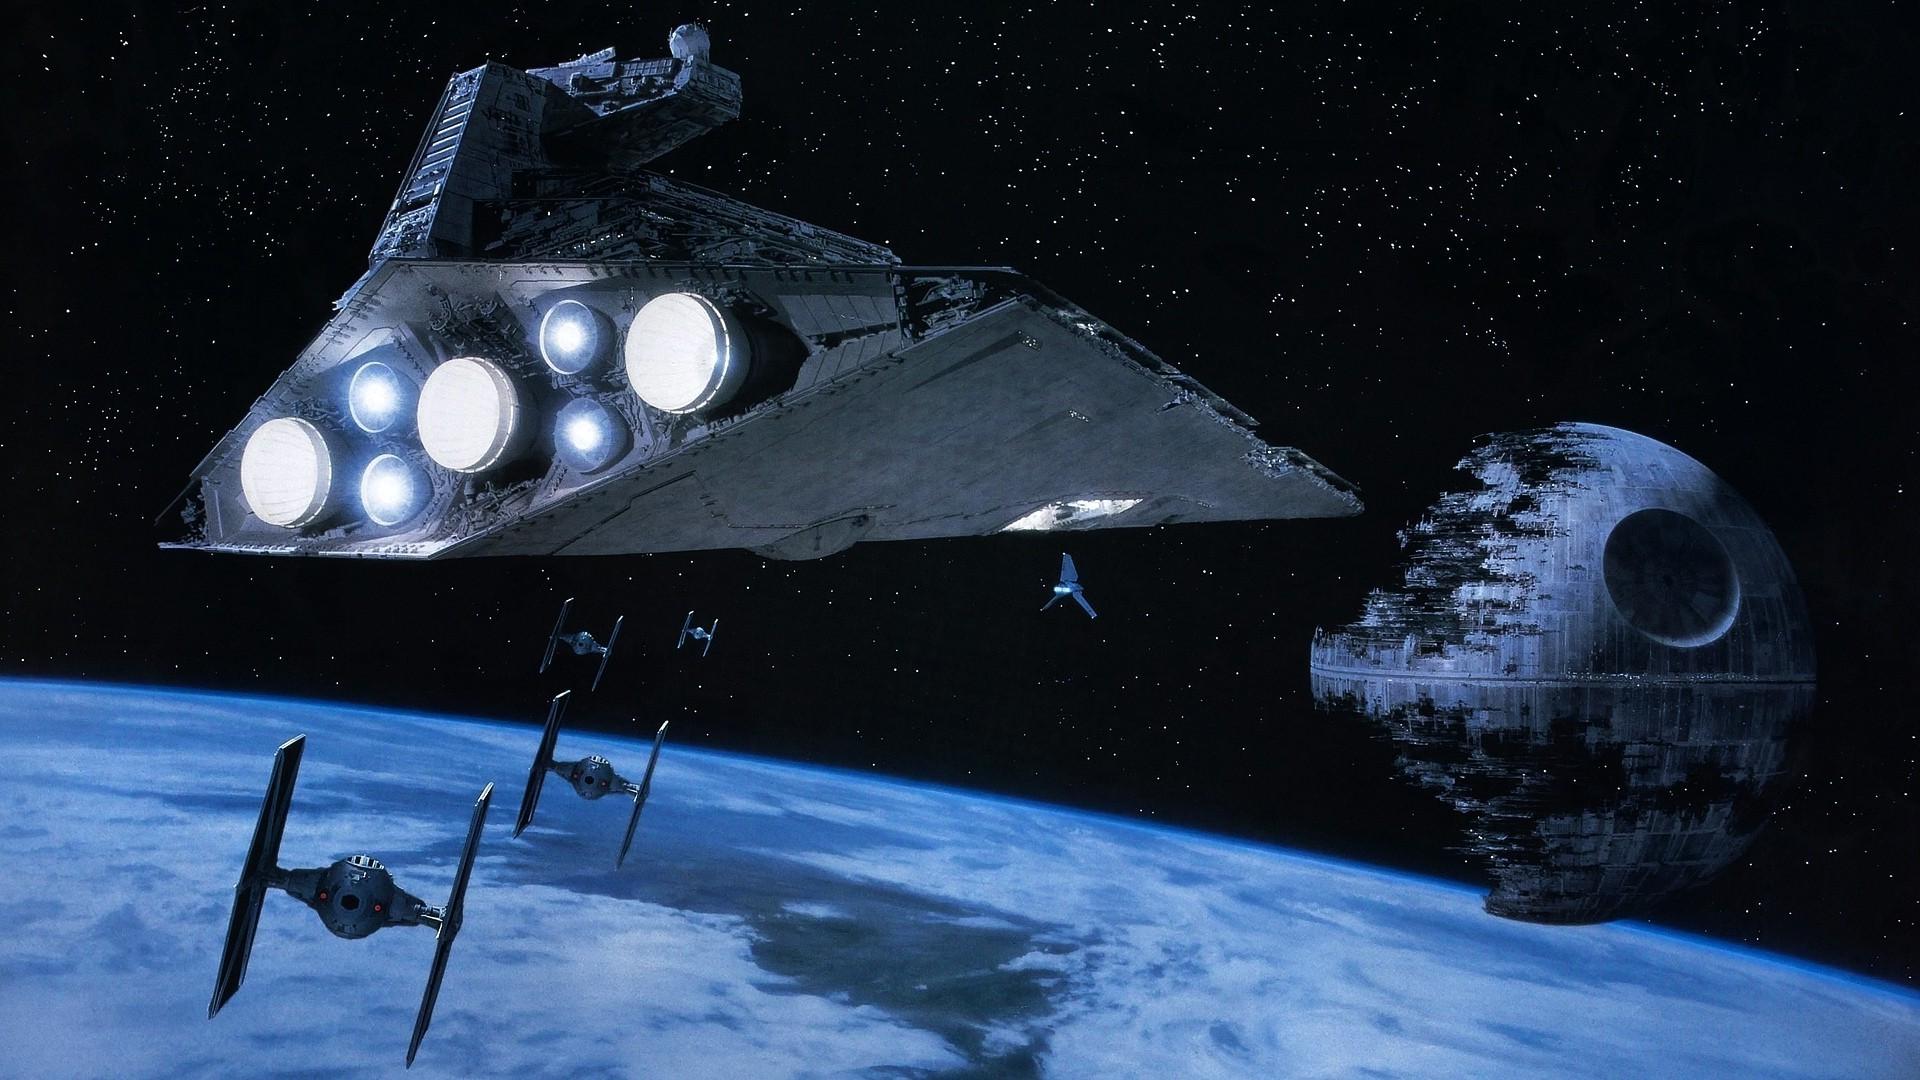 Star Wars, Star Destroyer, TIE Fighter, Death Star Wallpapers HD / Desktop  and Mobile Backgrounds